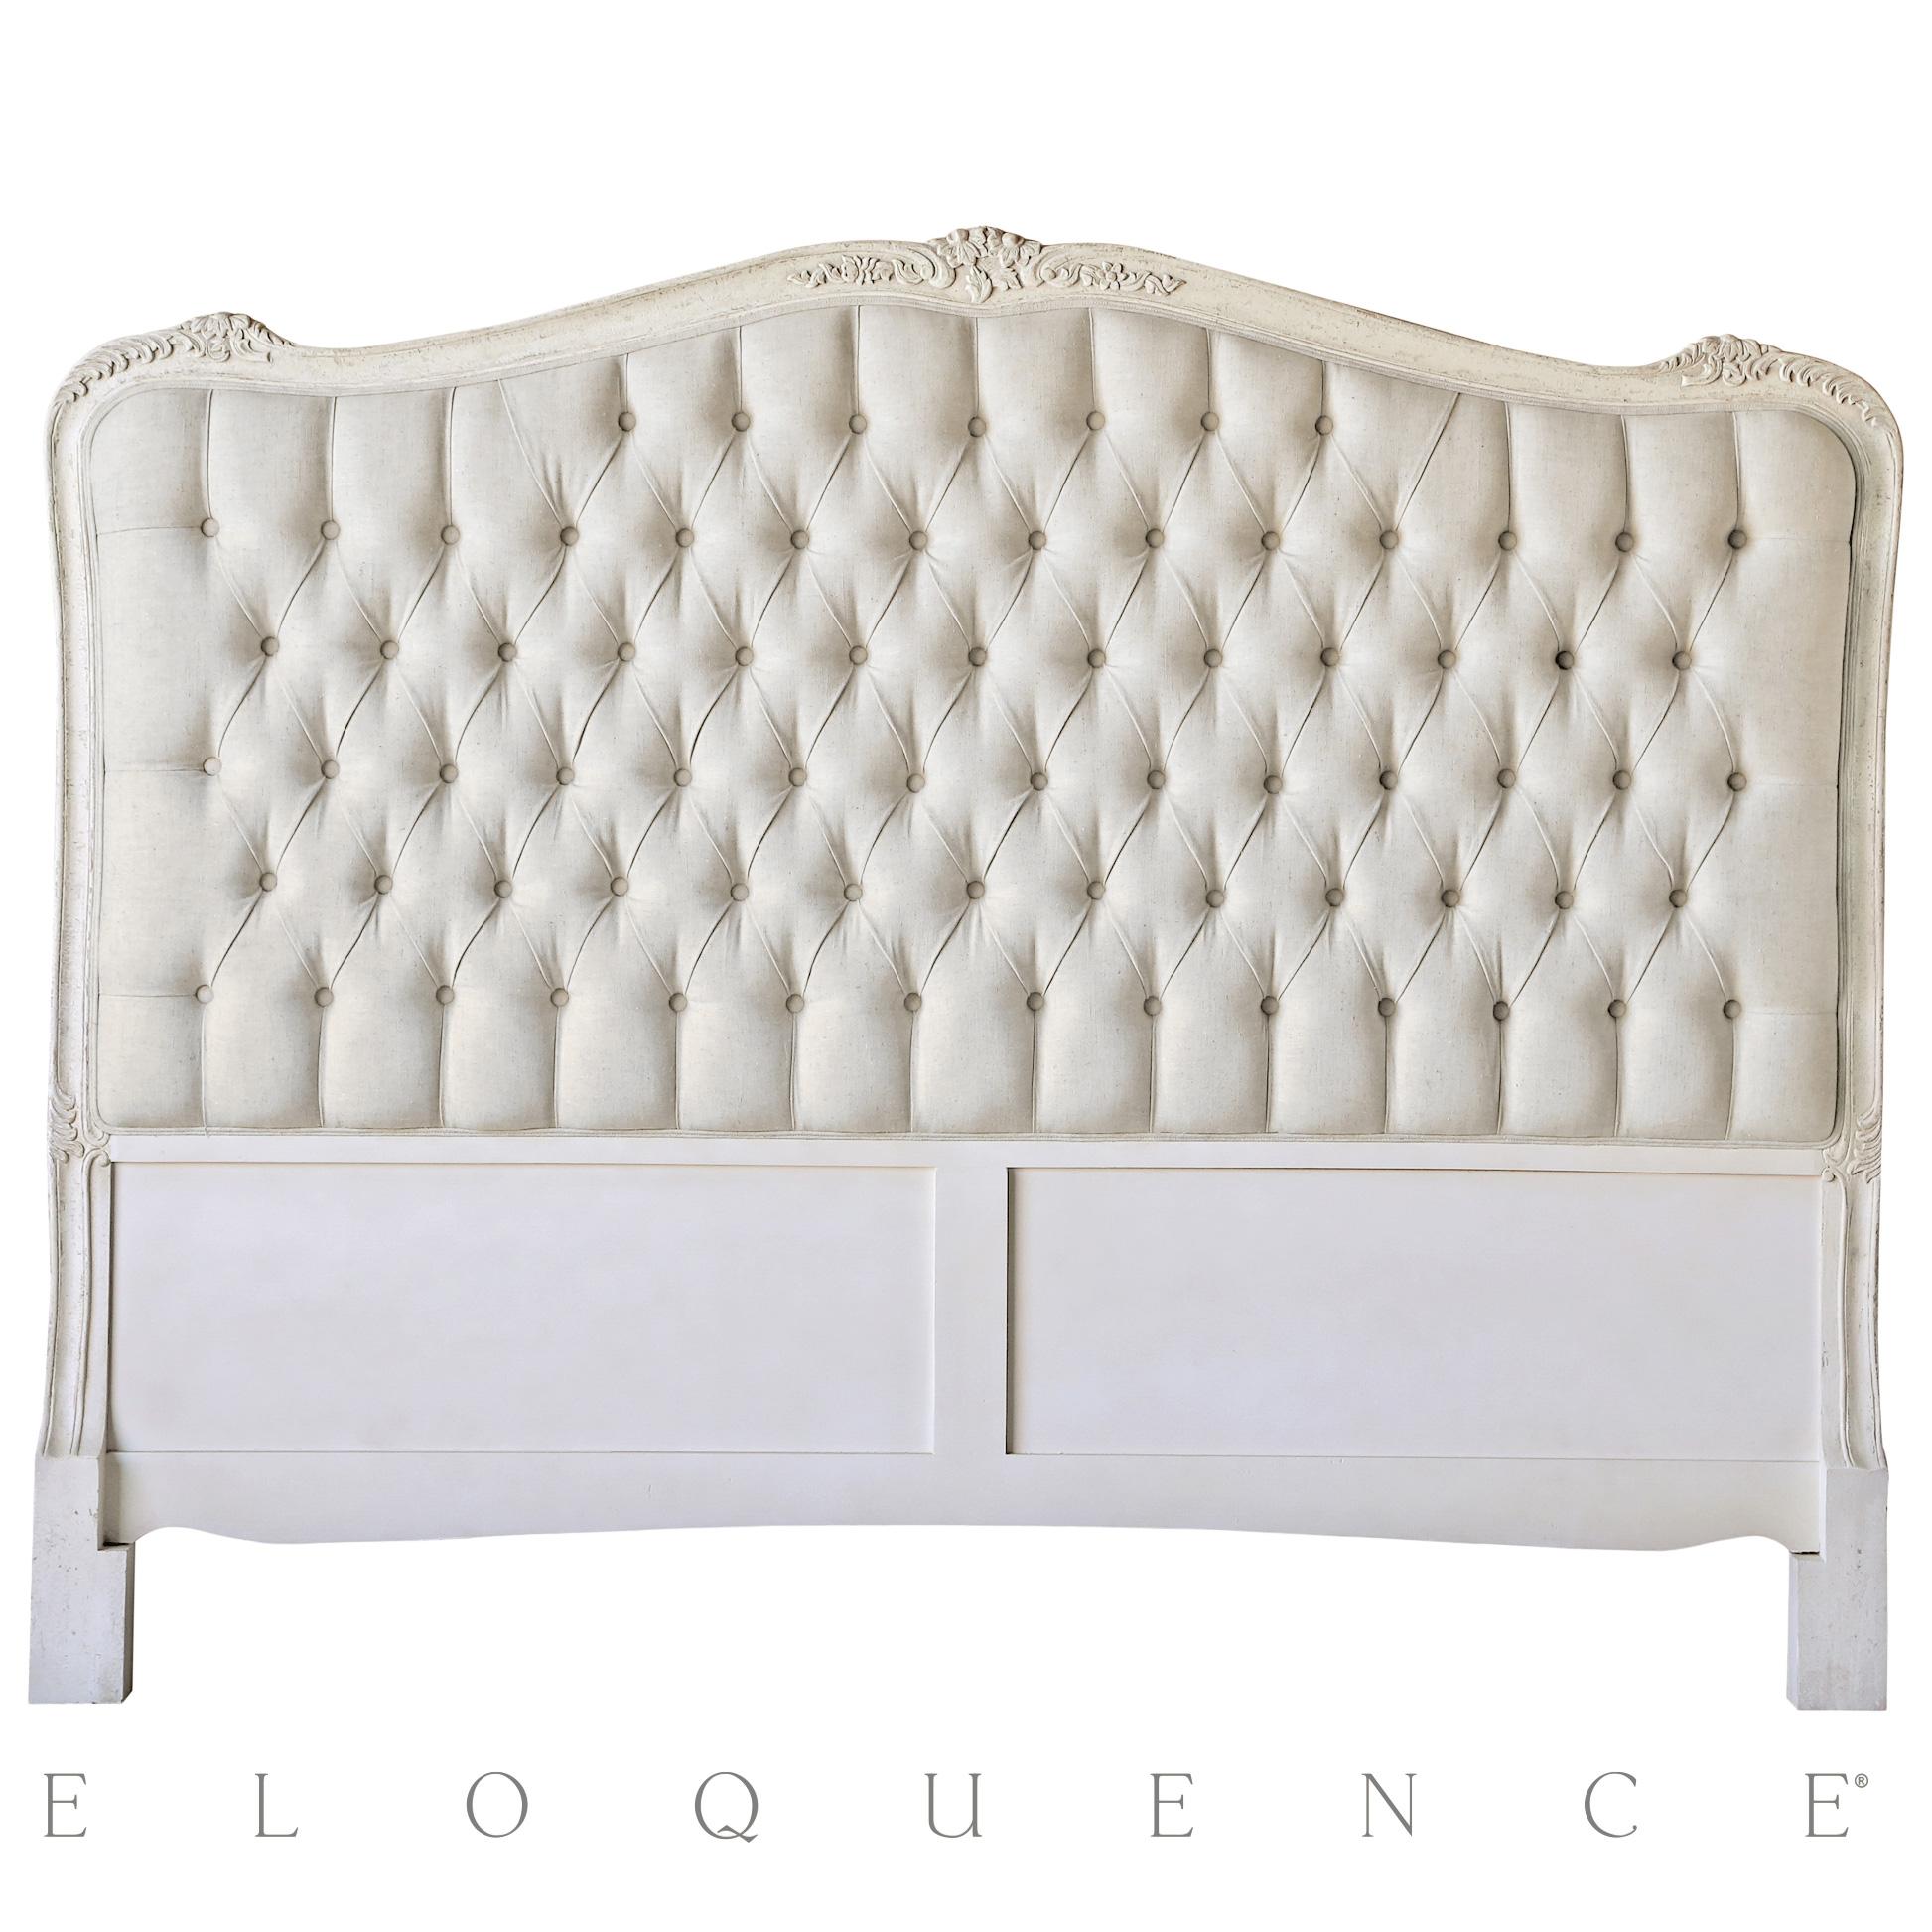 Eloquence® Sophia King Headboard in Weathered White